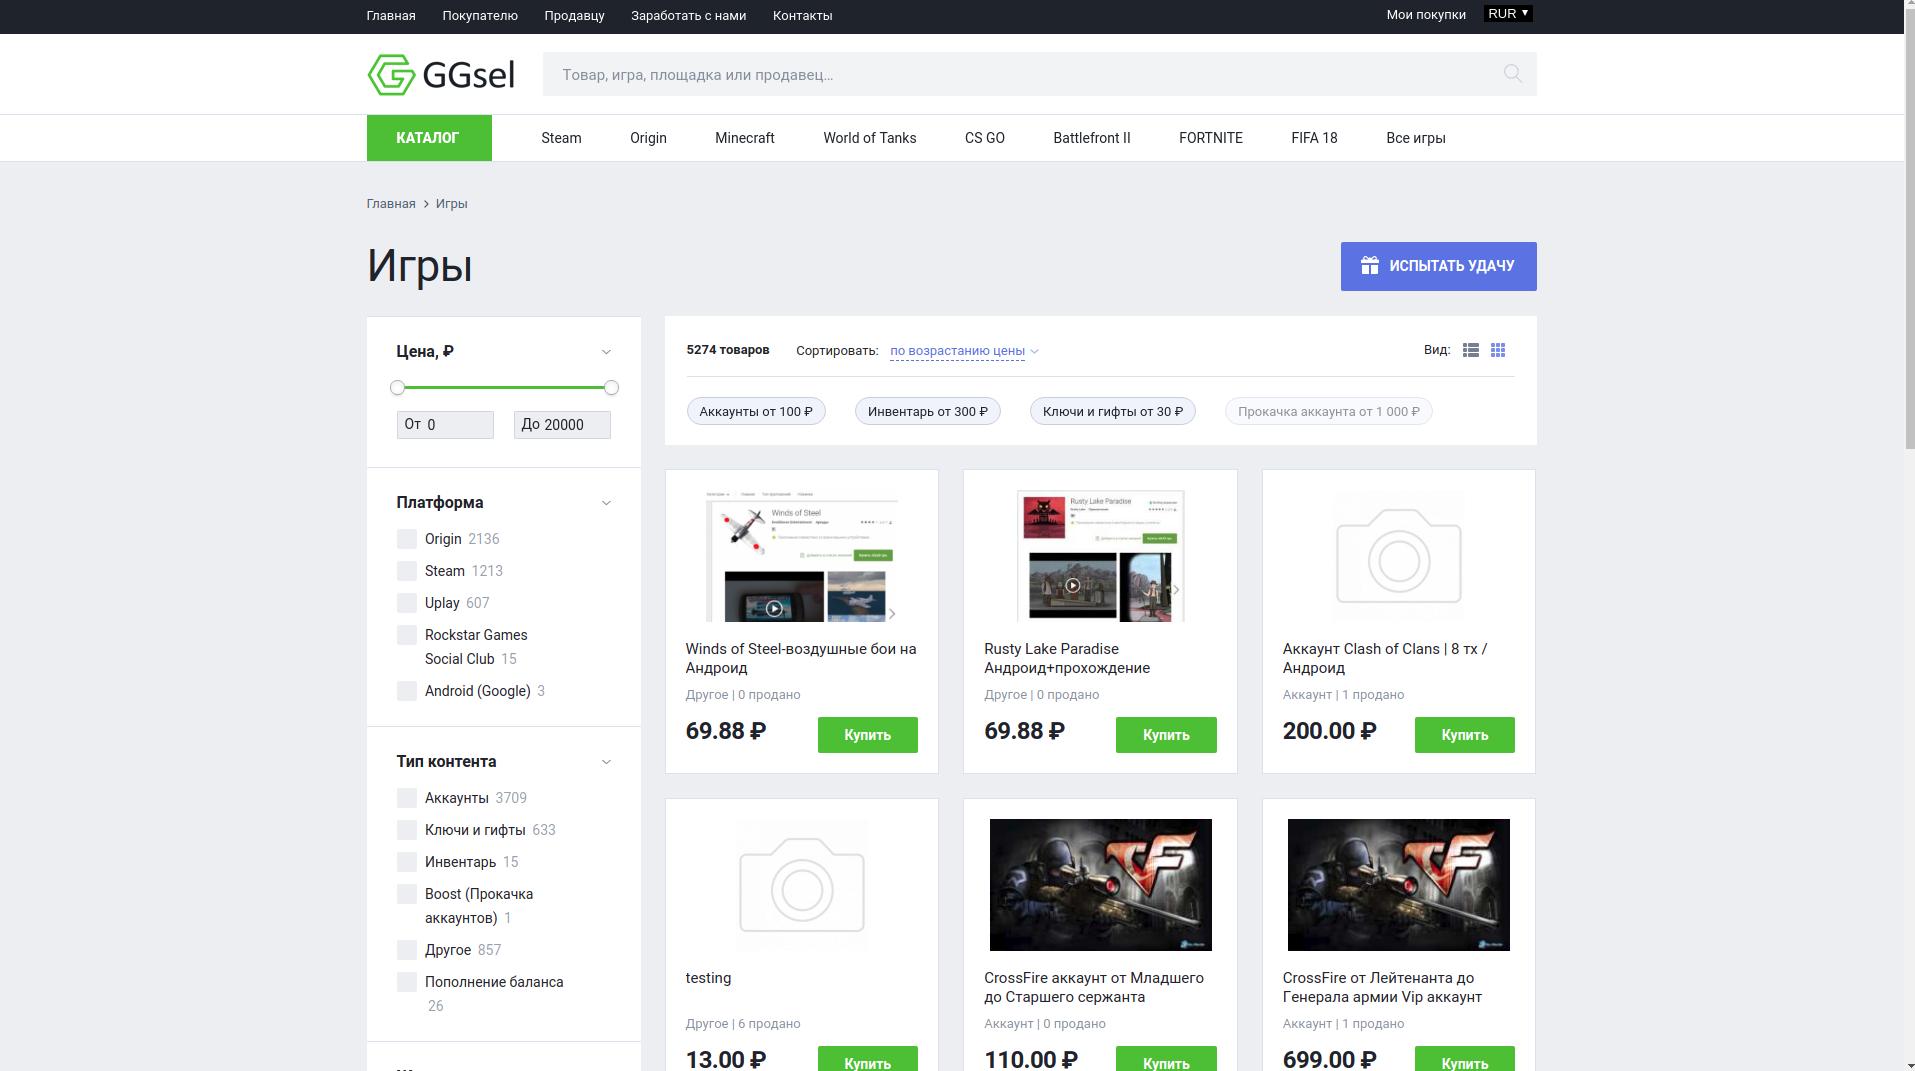 Ggsel.com